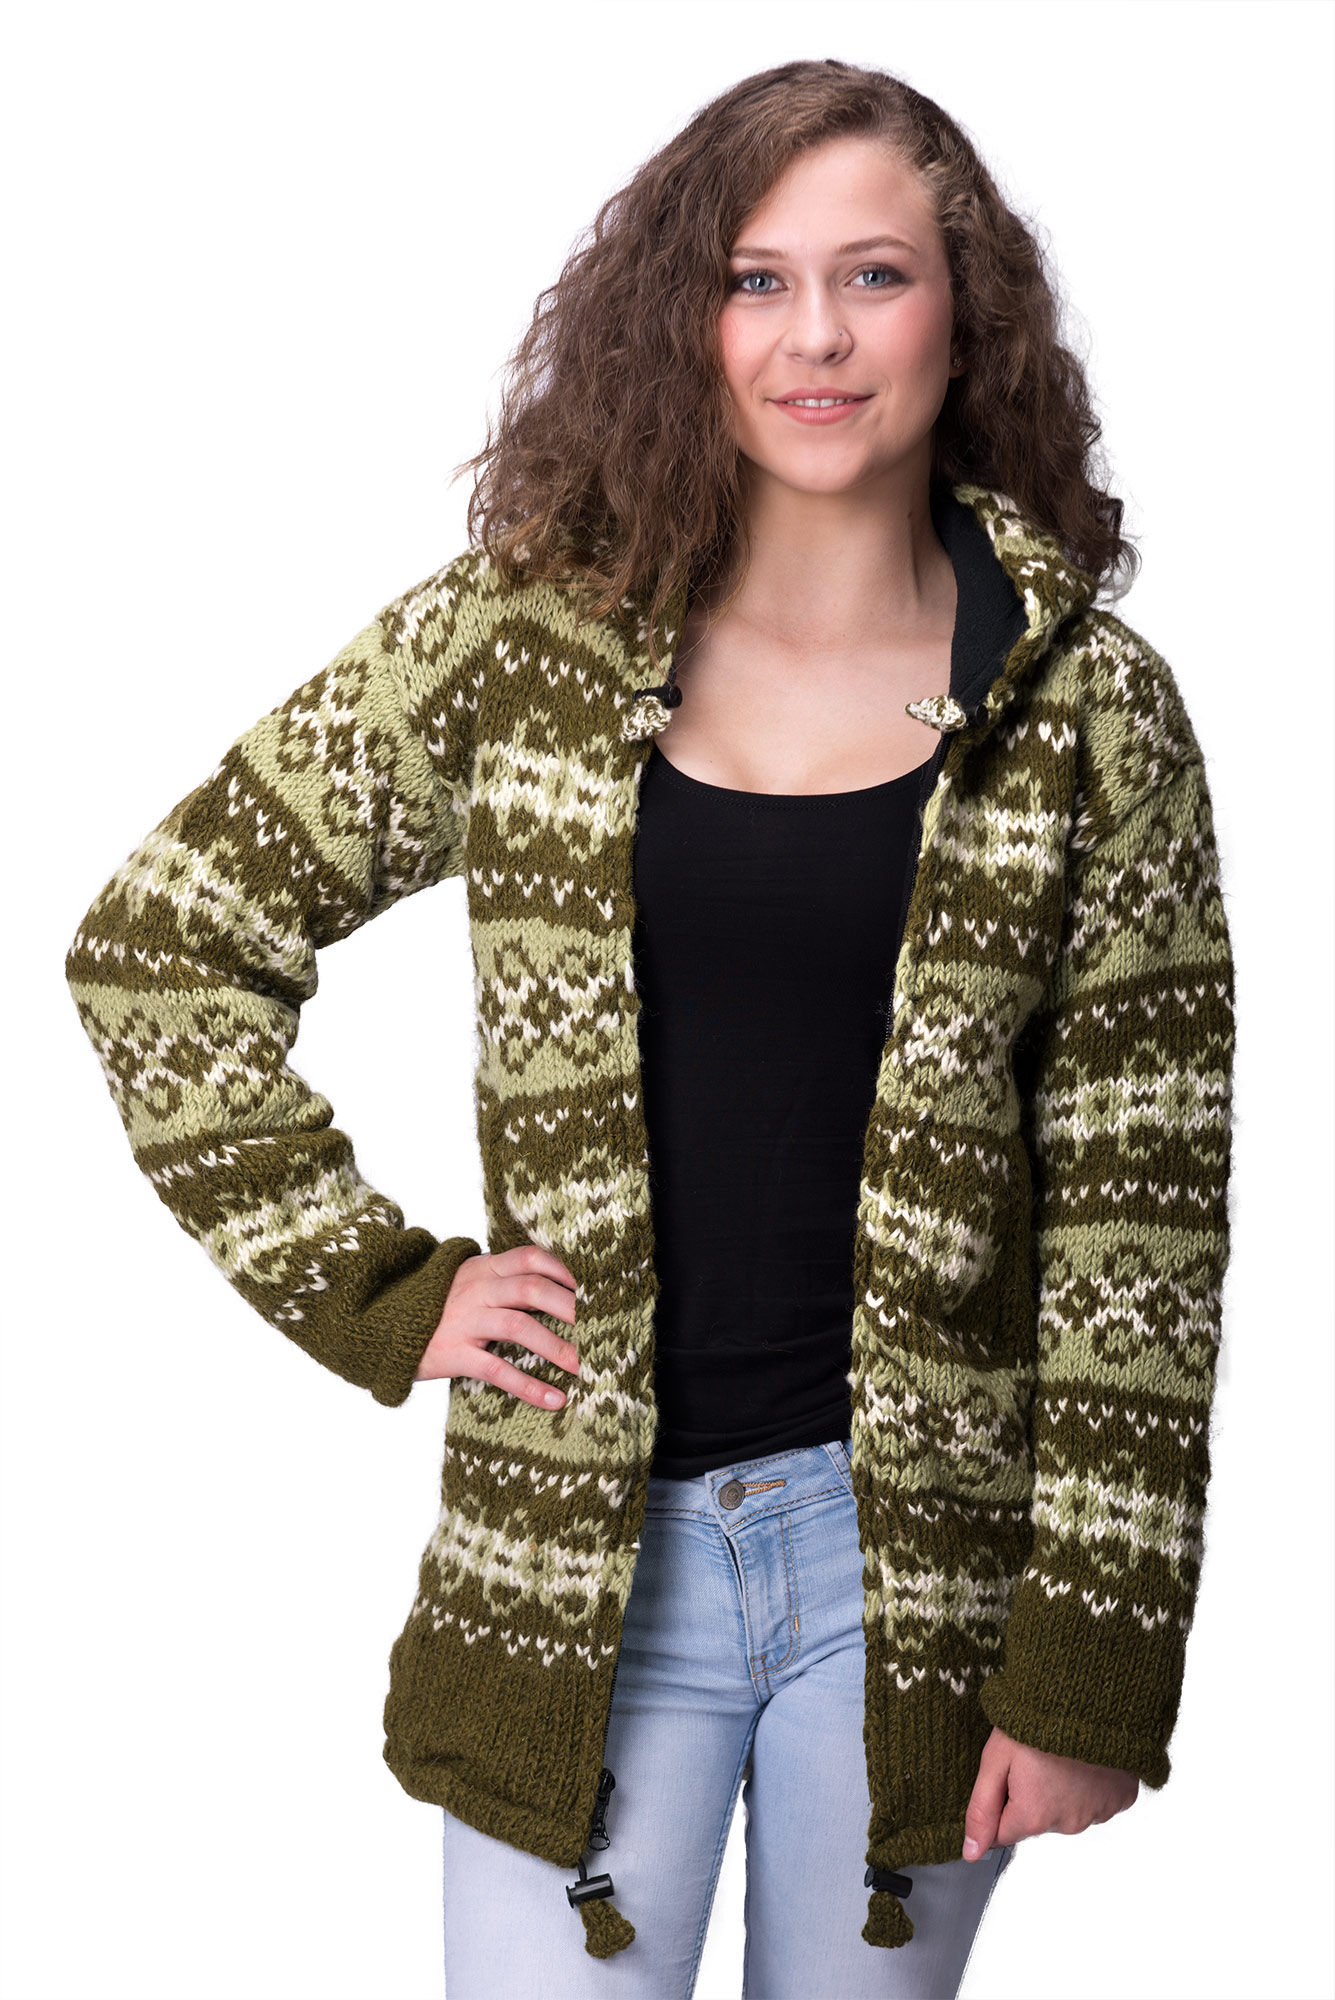 Wool Vintage Himalayan Mountain Jacket – Long Length Avocado & Olive